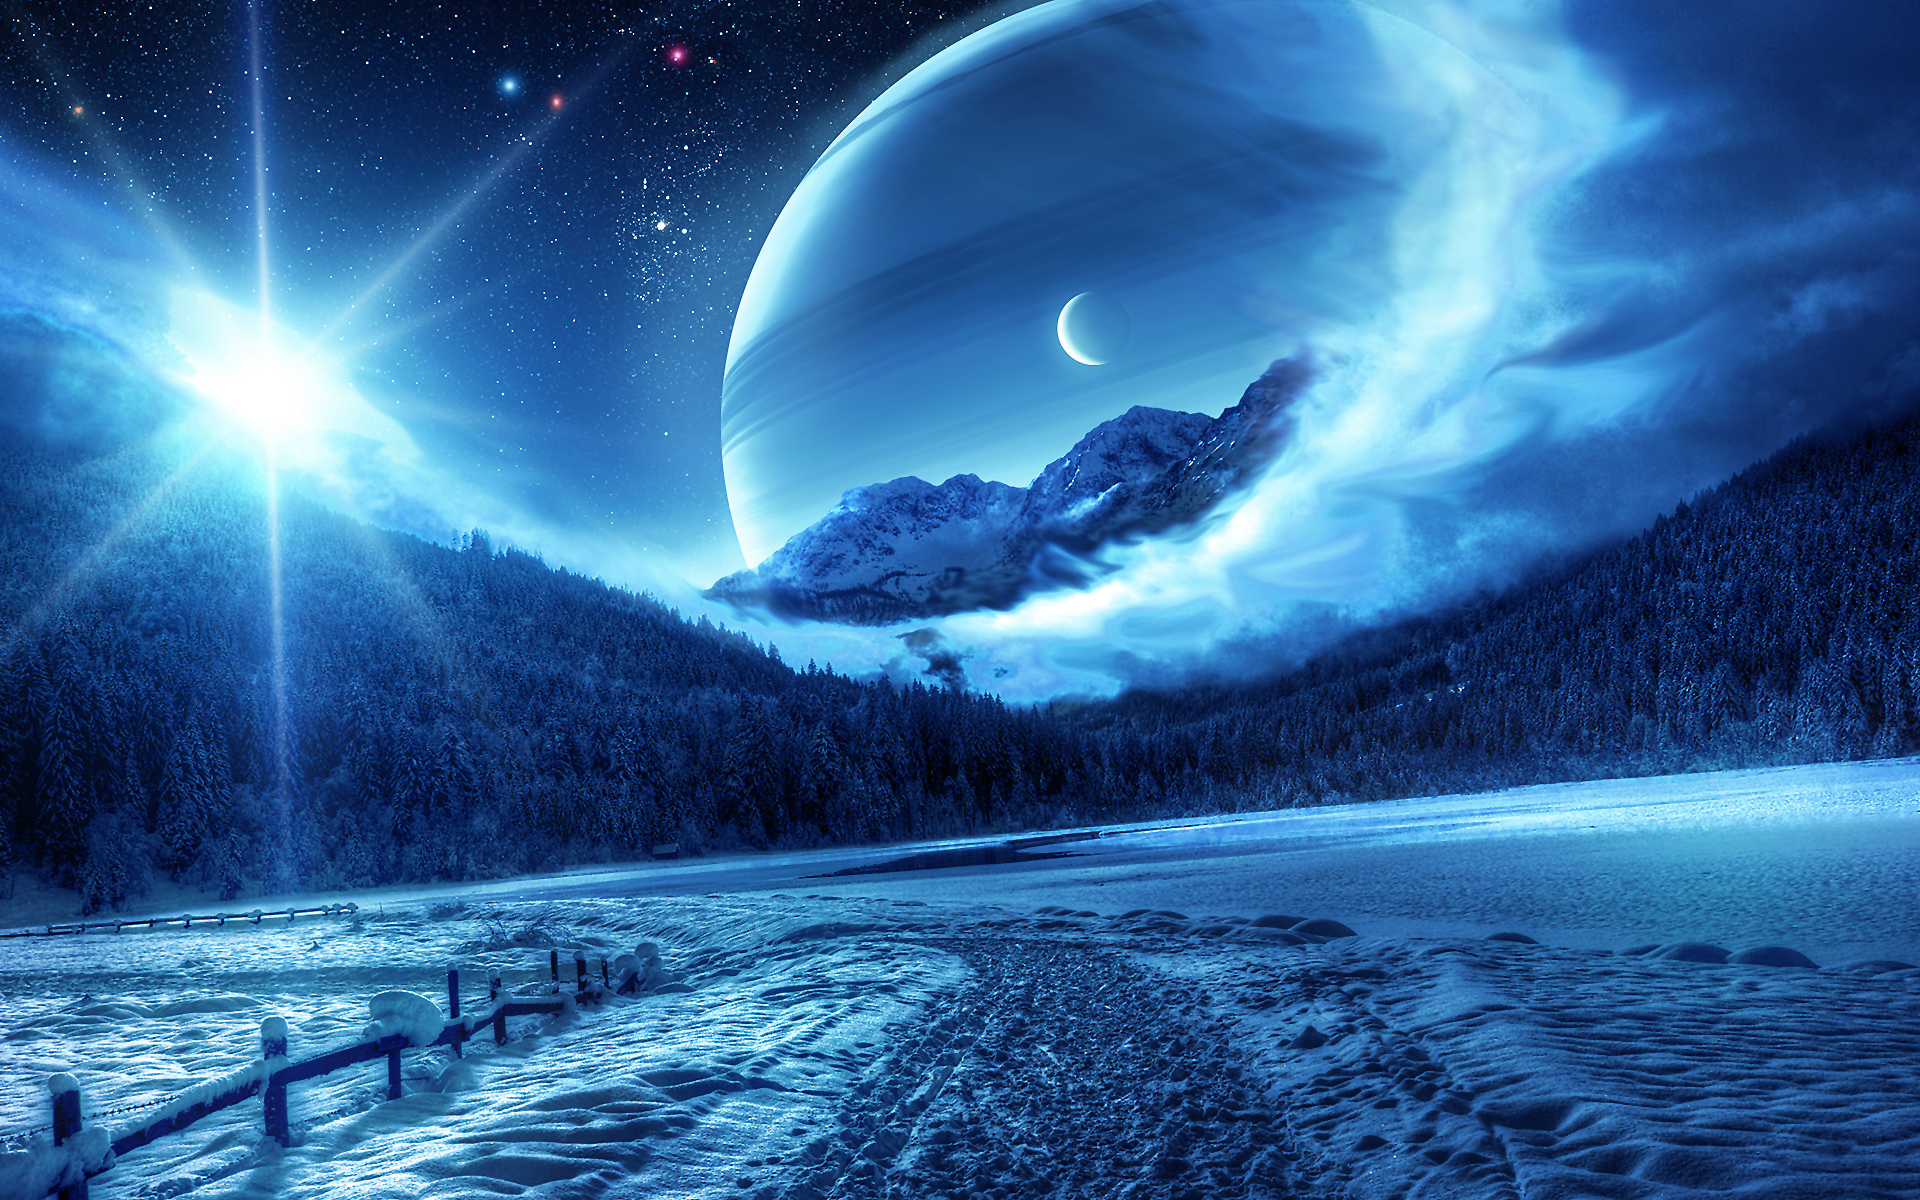 Fantasy winter scenery